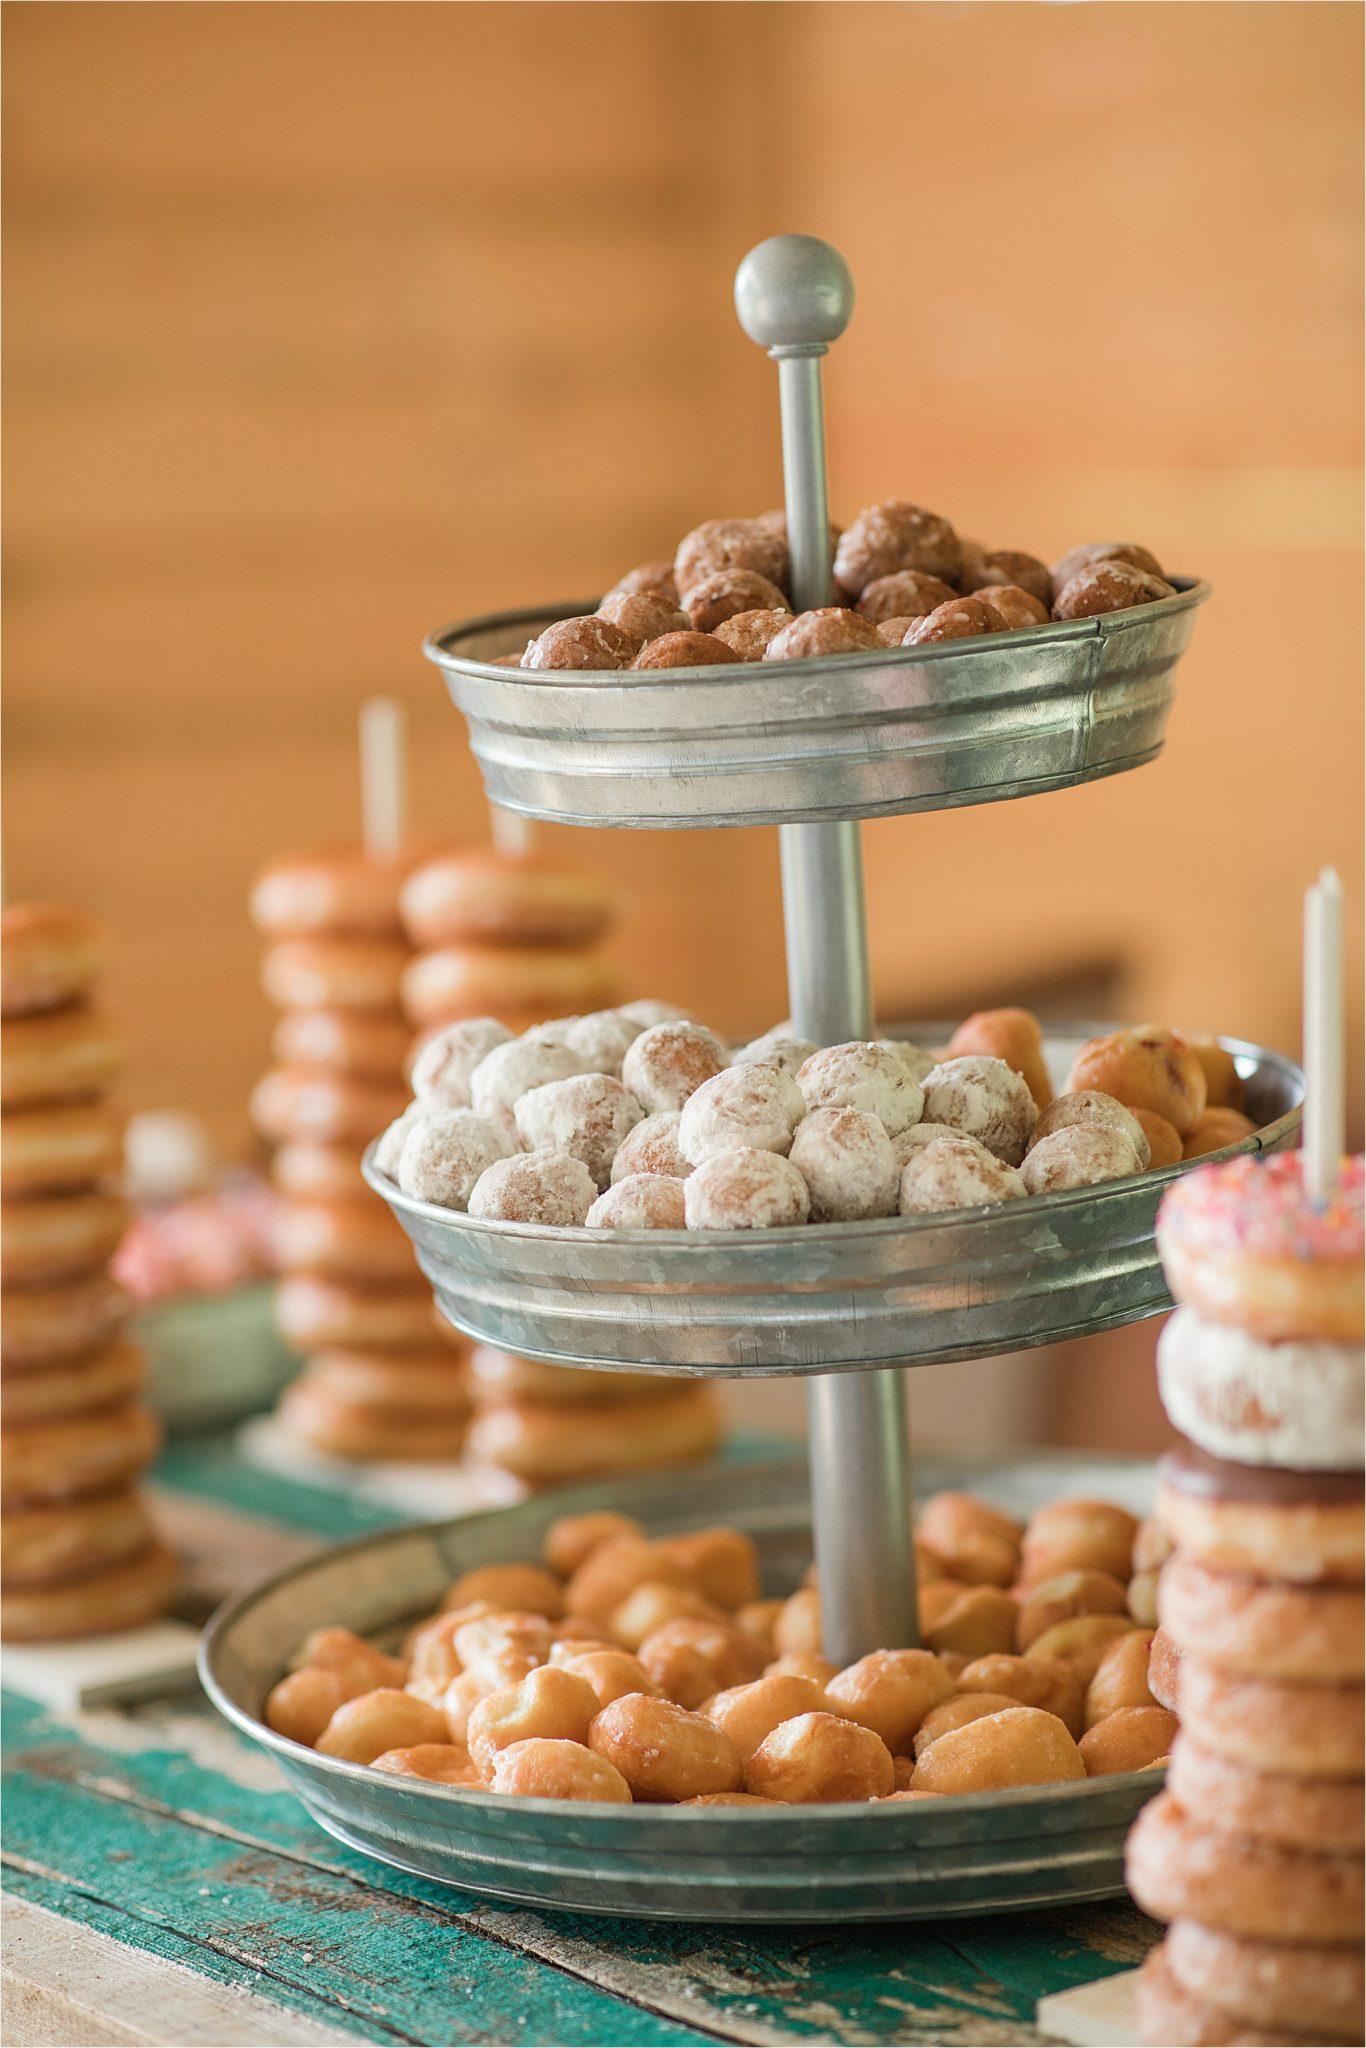 Hedge Farm Wedding, Alabama Wedding Photographer, Barn Wedding, Wedding details, Dessert table